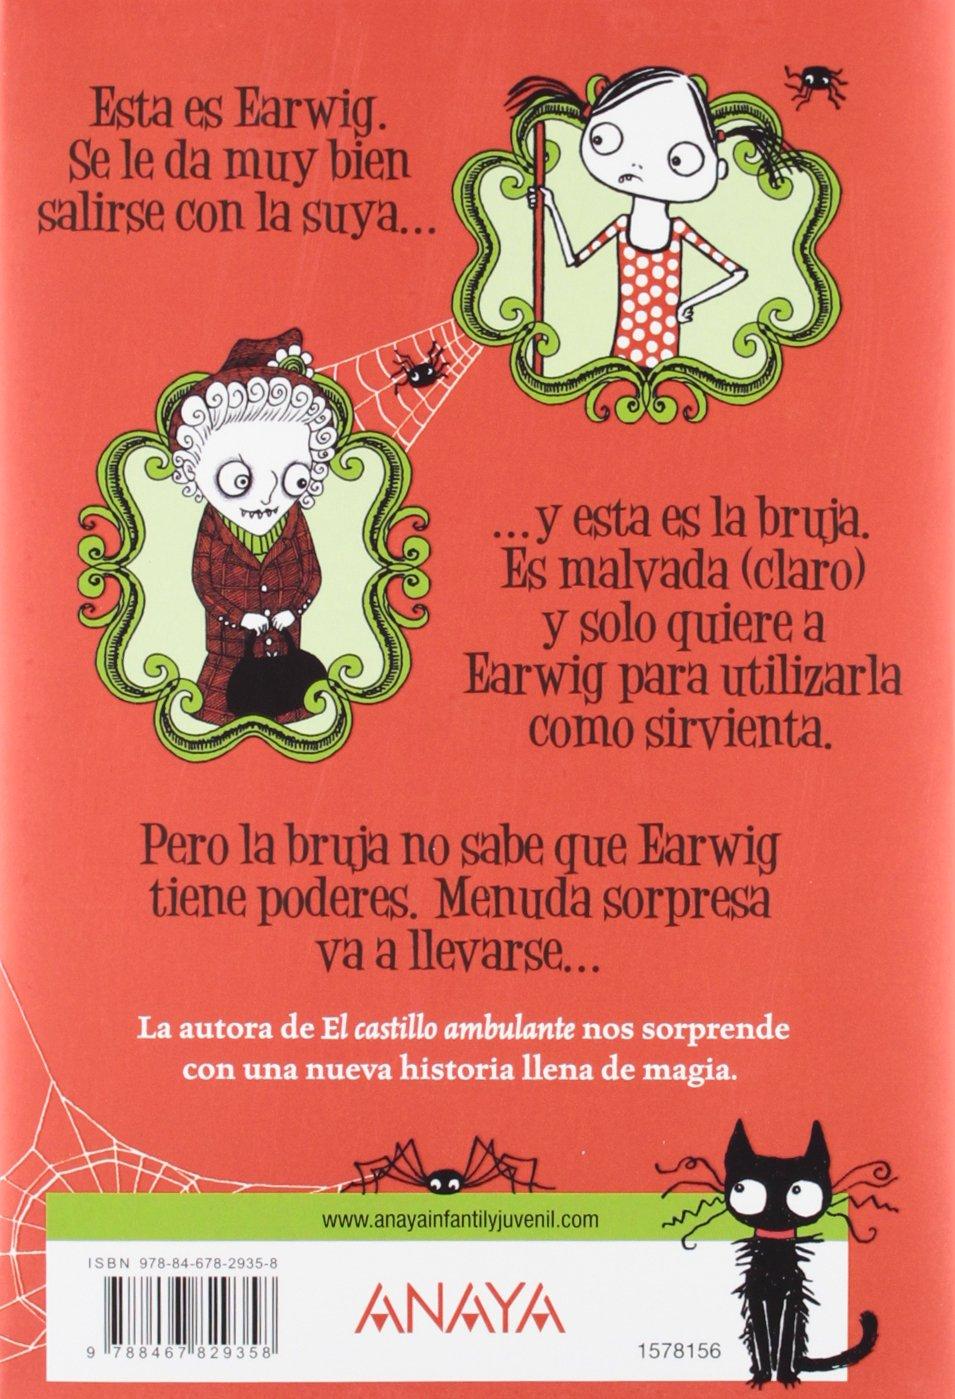 Amazon.com: Earwig y la bruja (Spanish Edition) (9788467829358): Diana Wynne Jones, Marion Lindsay: Books